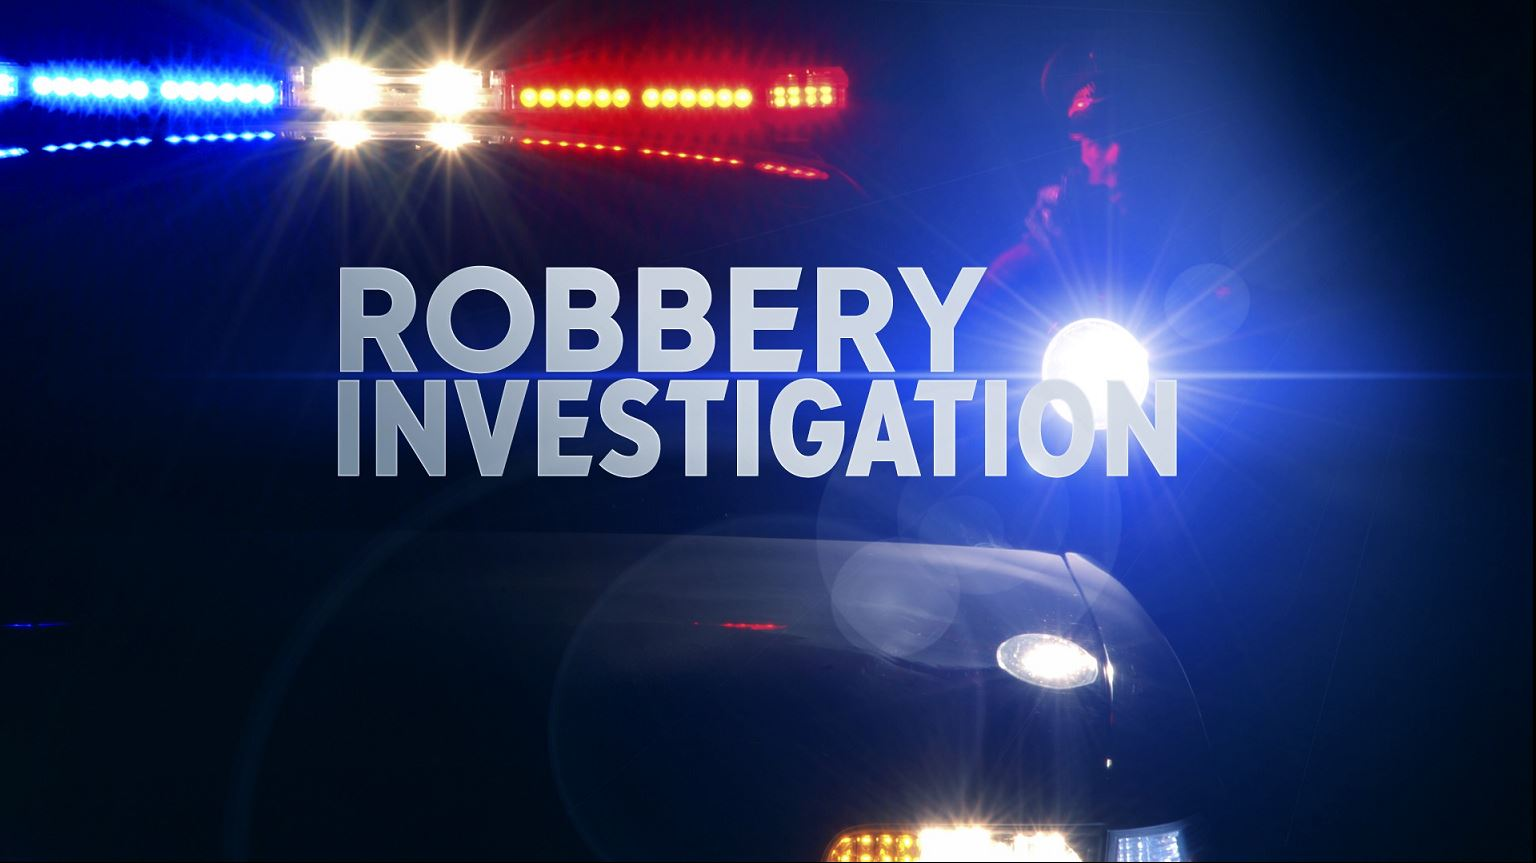 robbery_1554871071134.JPG